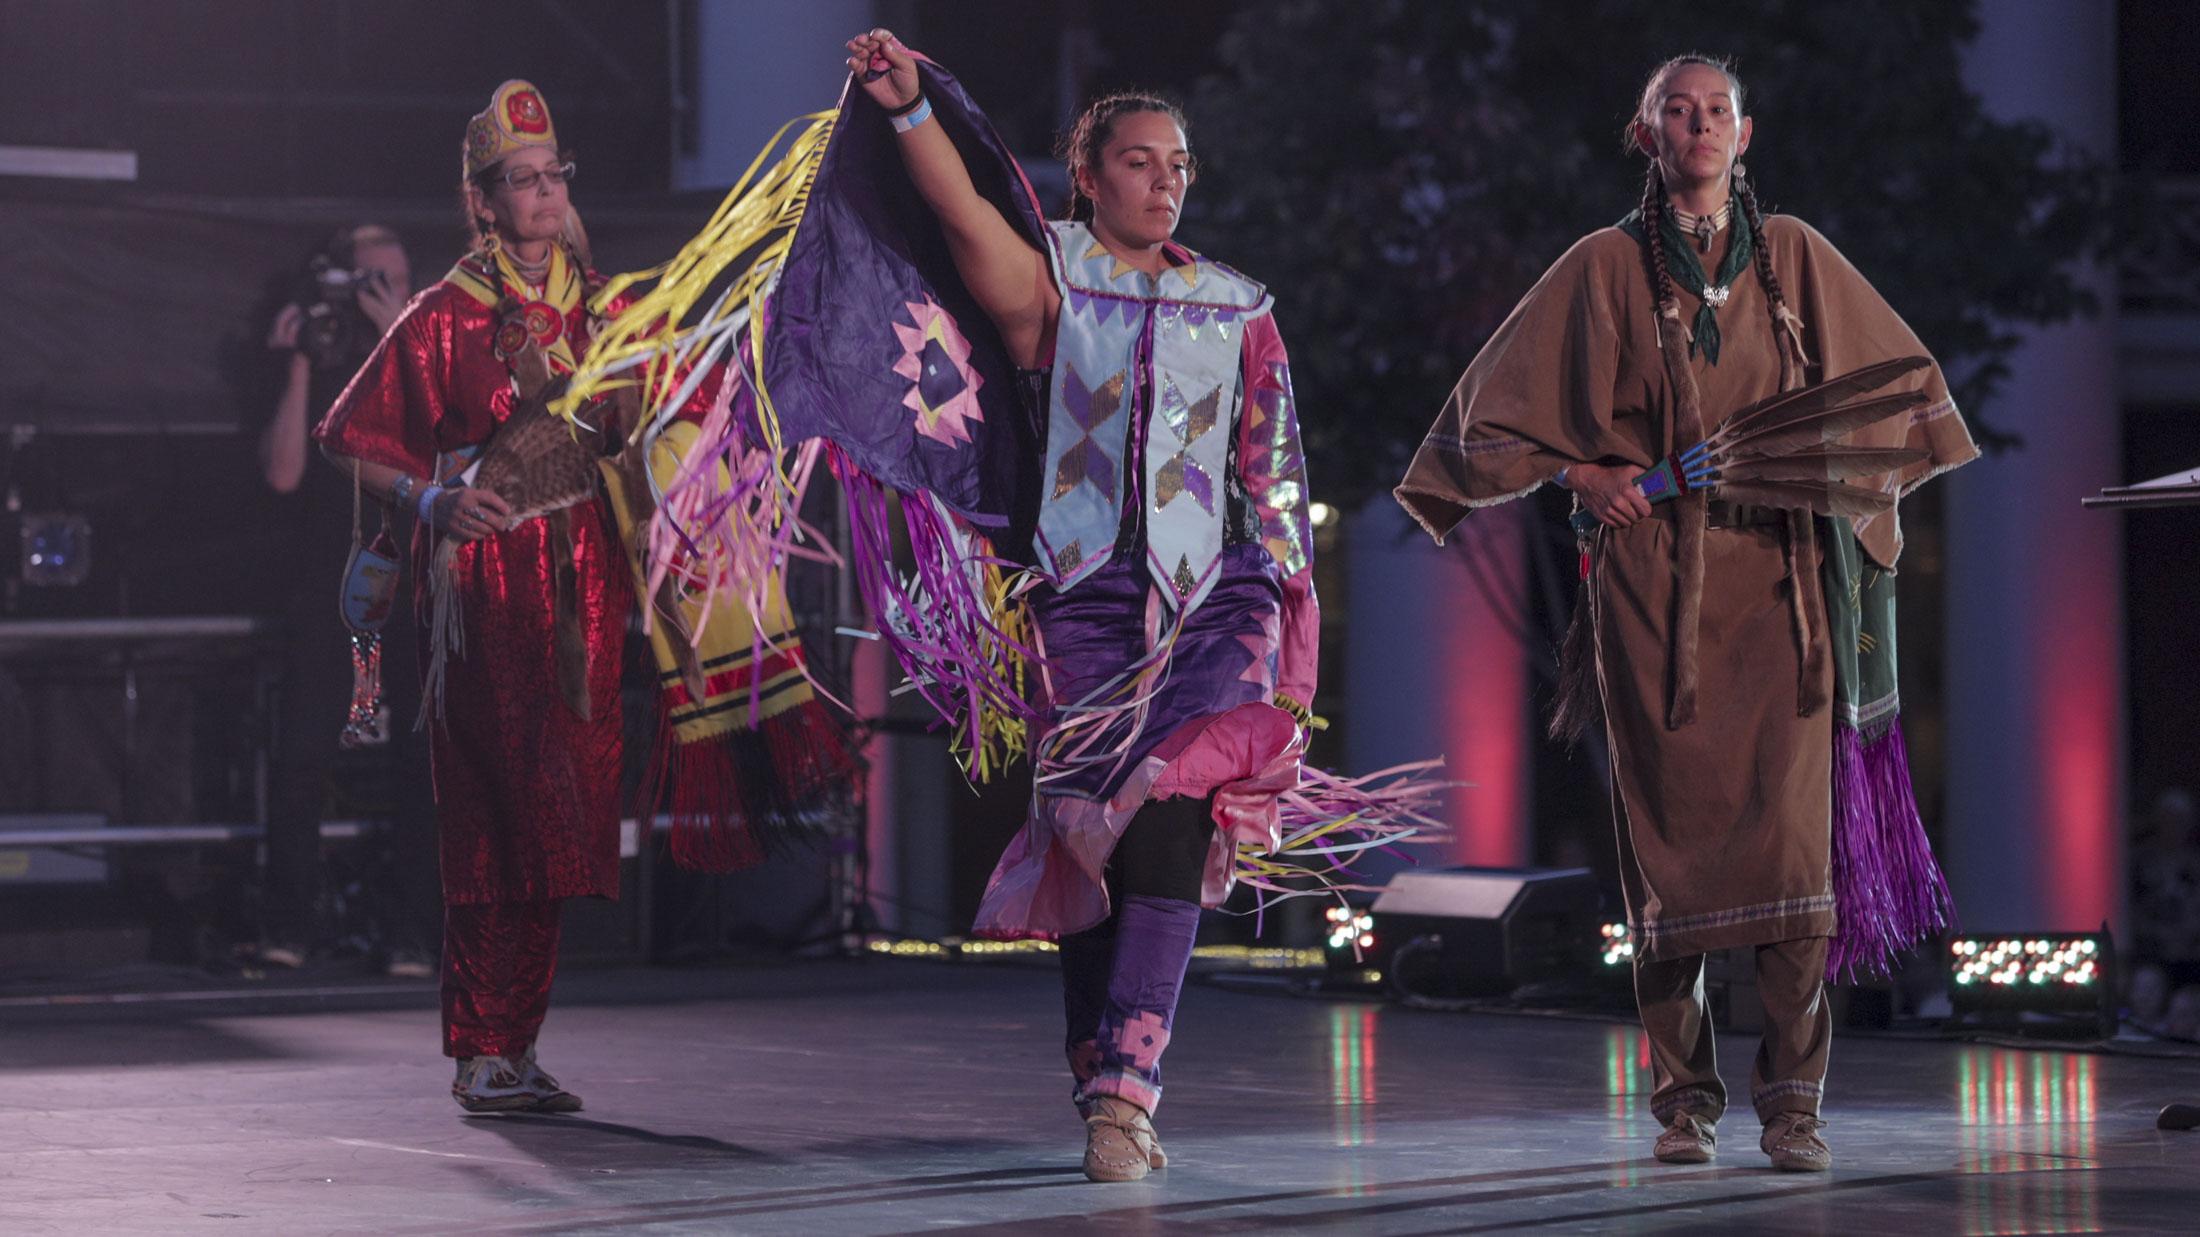 Monocan dancers